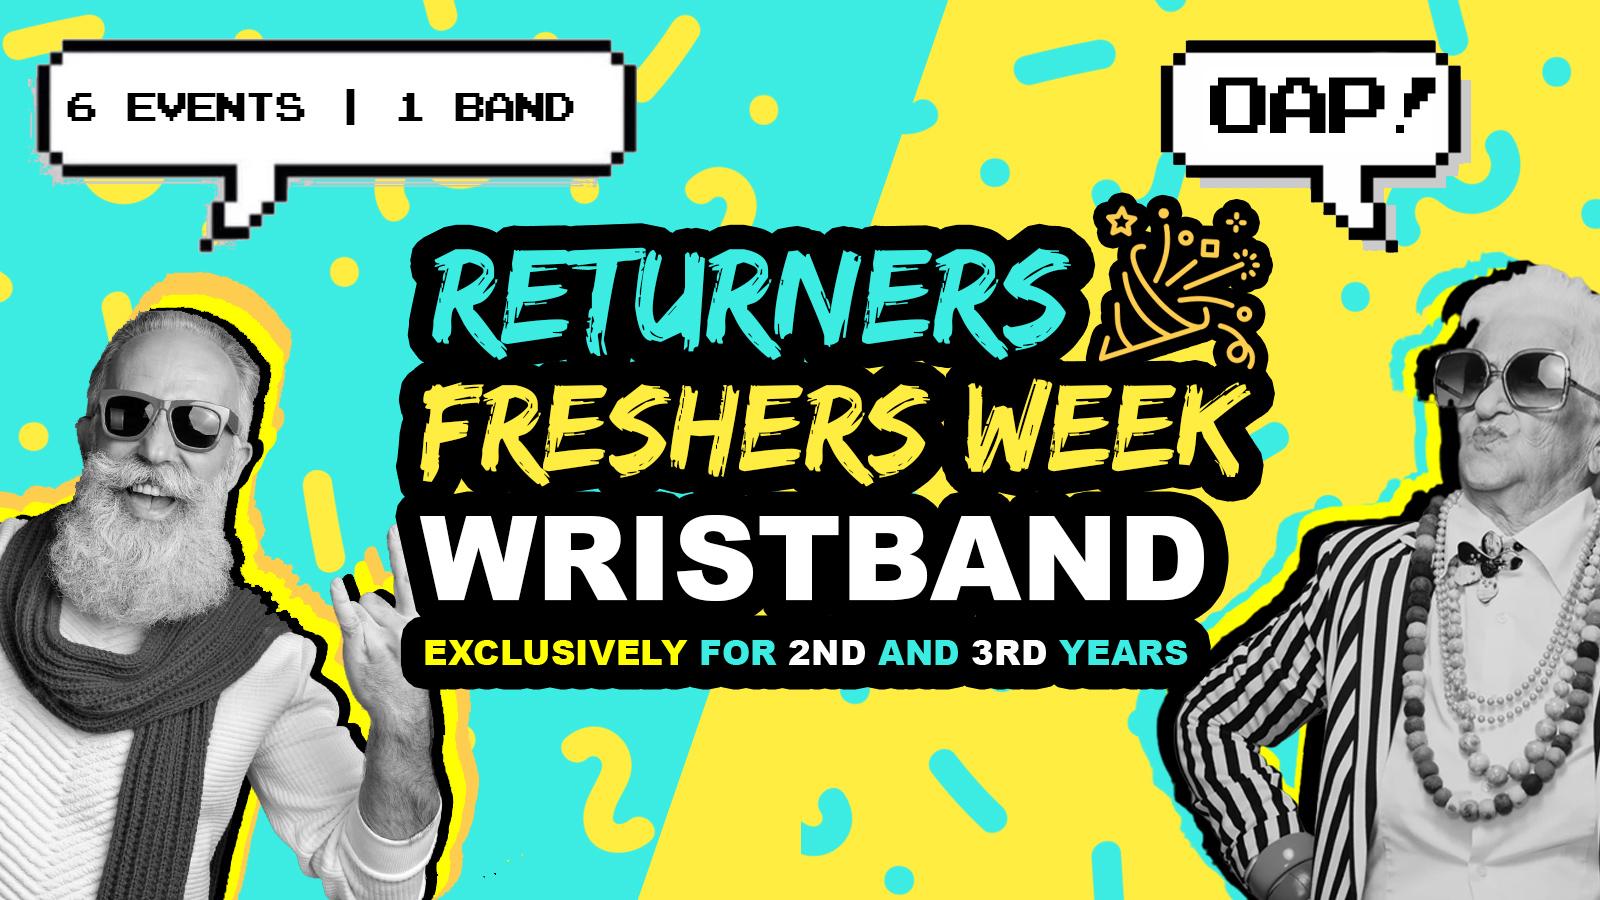 Birmingham Returners Freshers Week Wristband 2021 | Exclusive for 2nd & 3rd Years